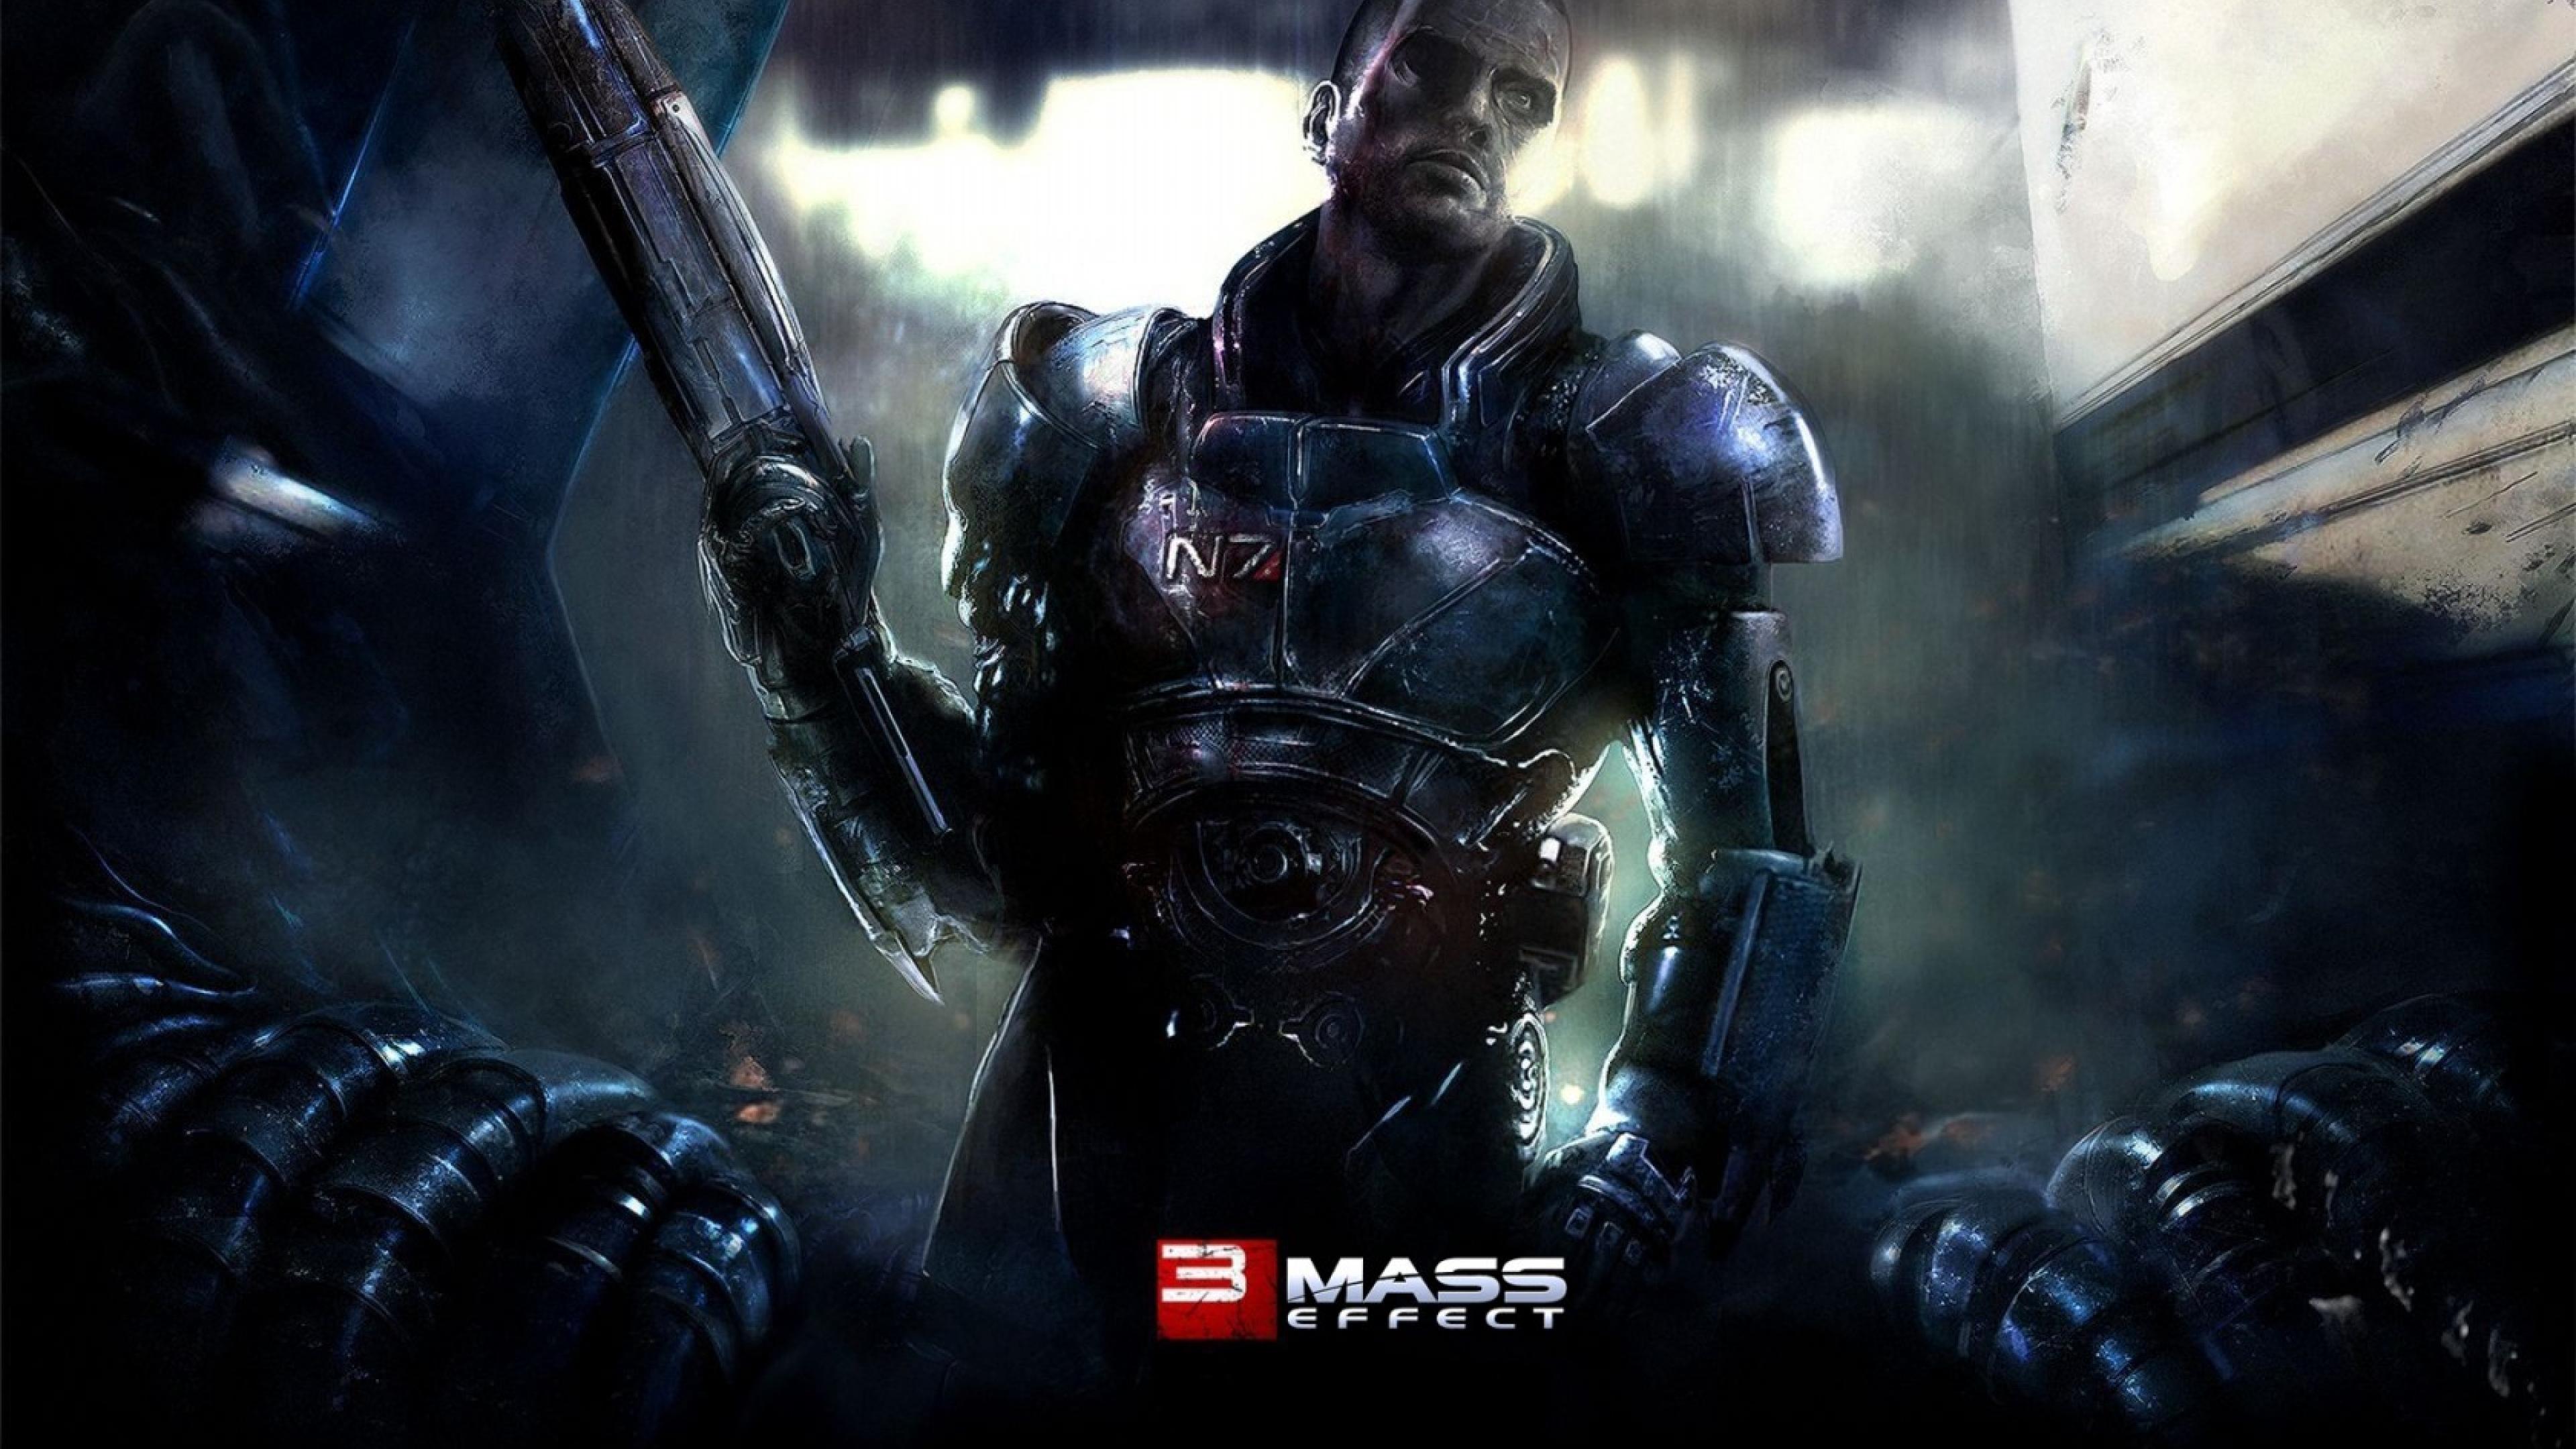 3840x2160 Mass Effect 3 Shepard N7 4k Wallpaper Hd Games 4k